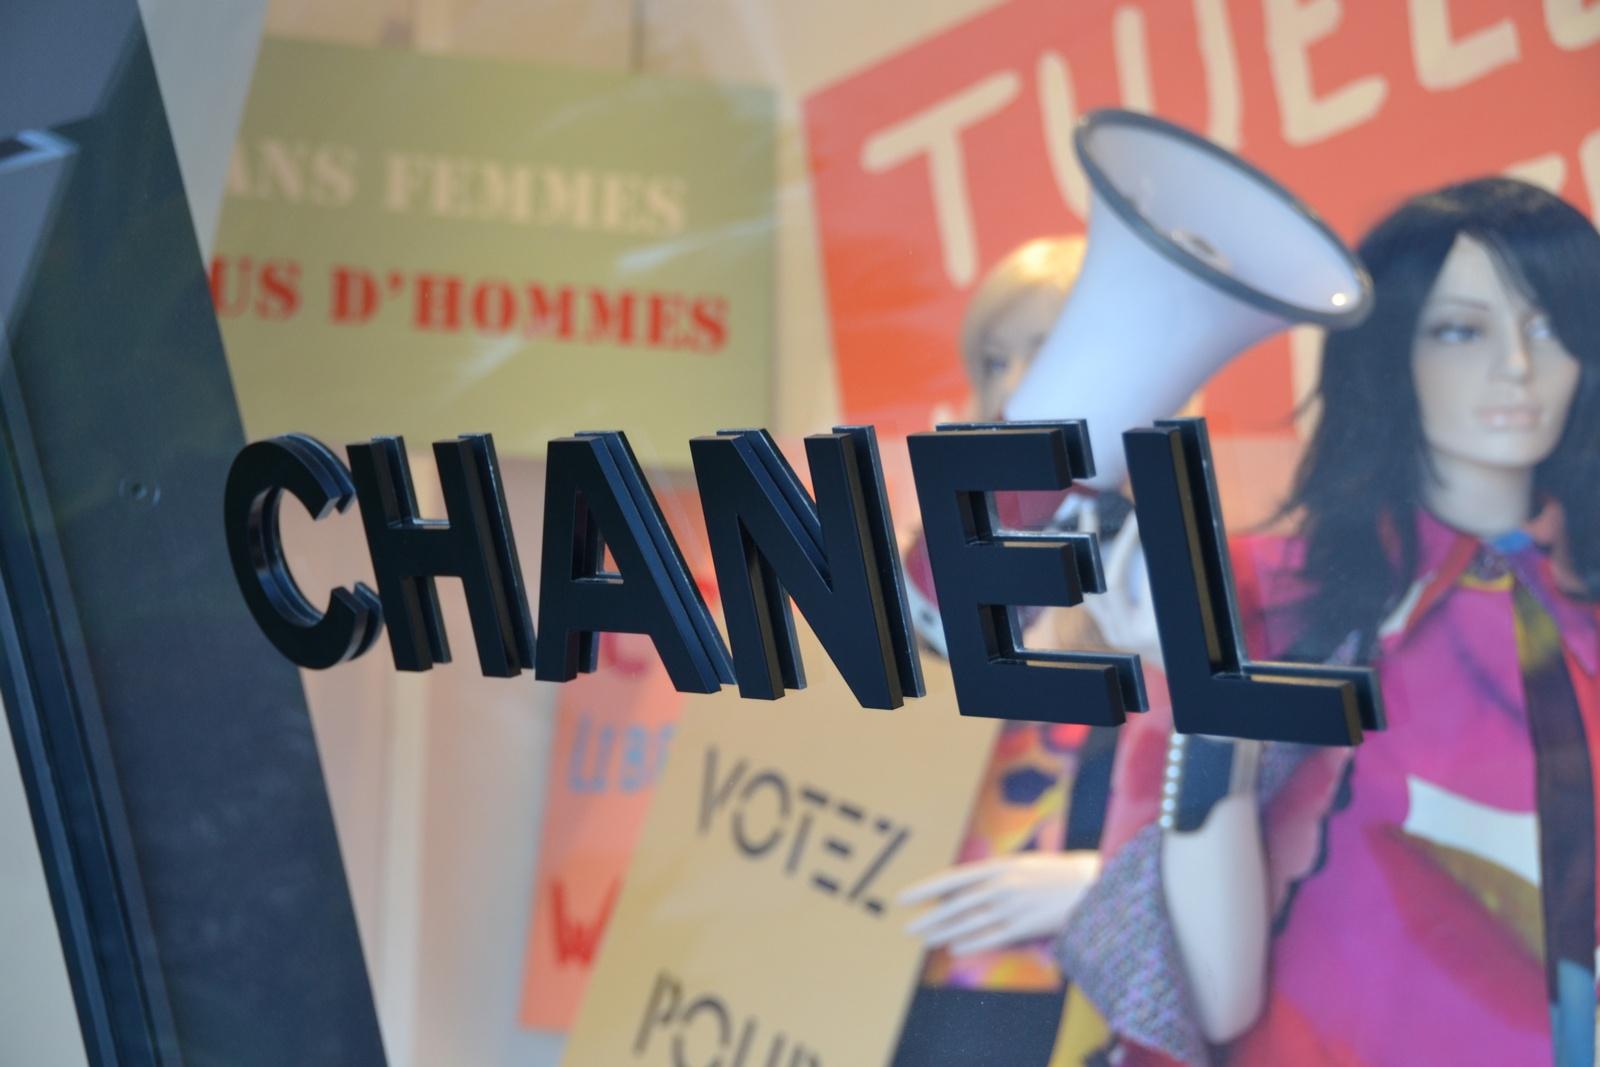 Chanel Monaco